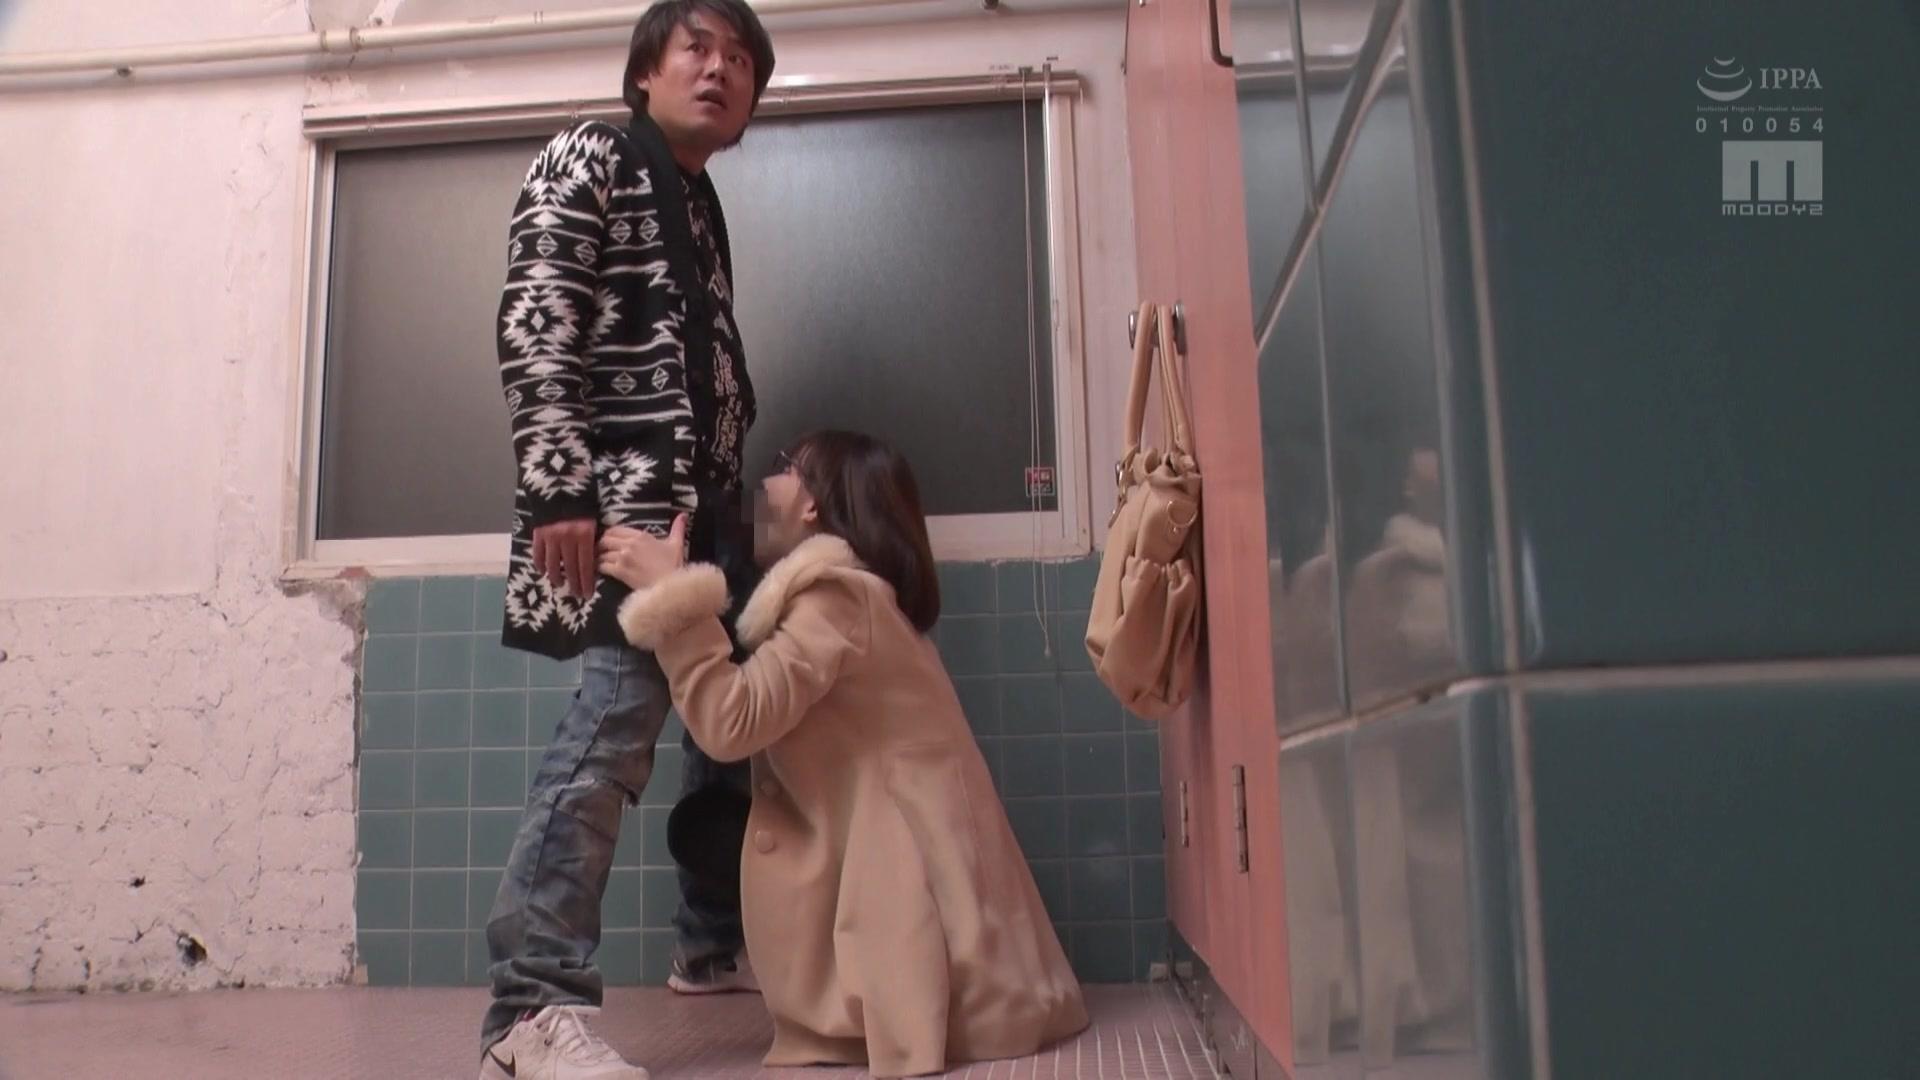 [MIAA-100] 我的女朋友被都市里男人夺走了身心 深田えいみ【外挂中字】 - 4of5